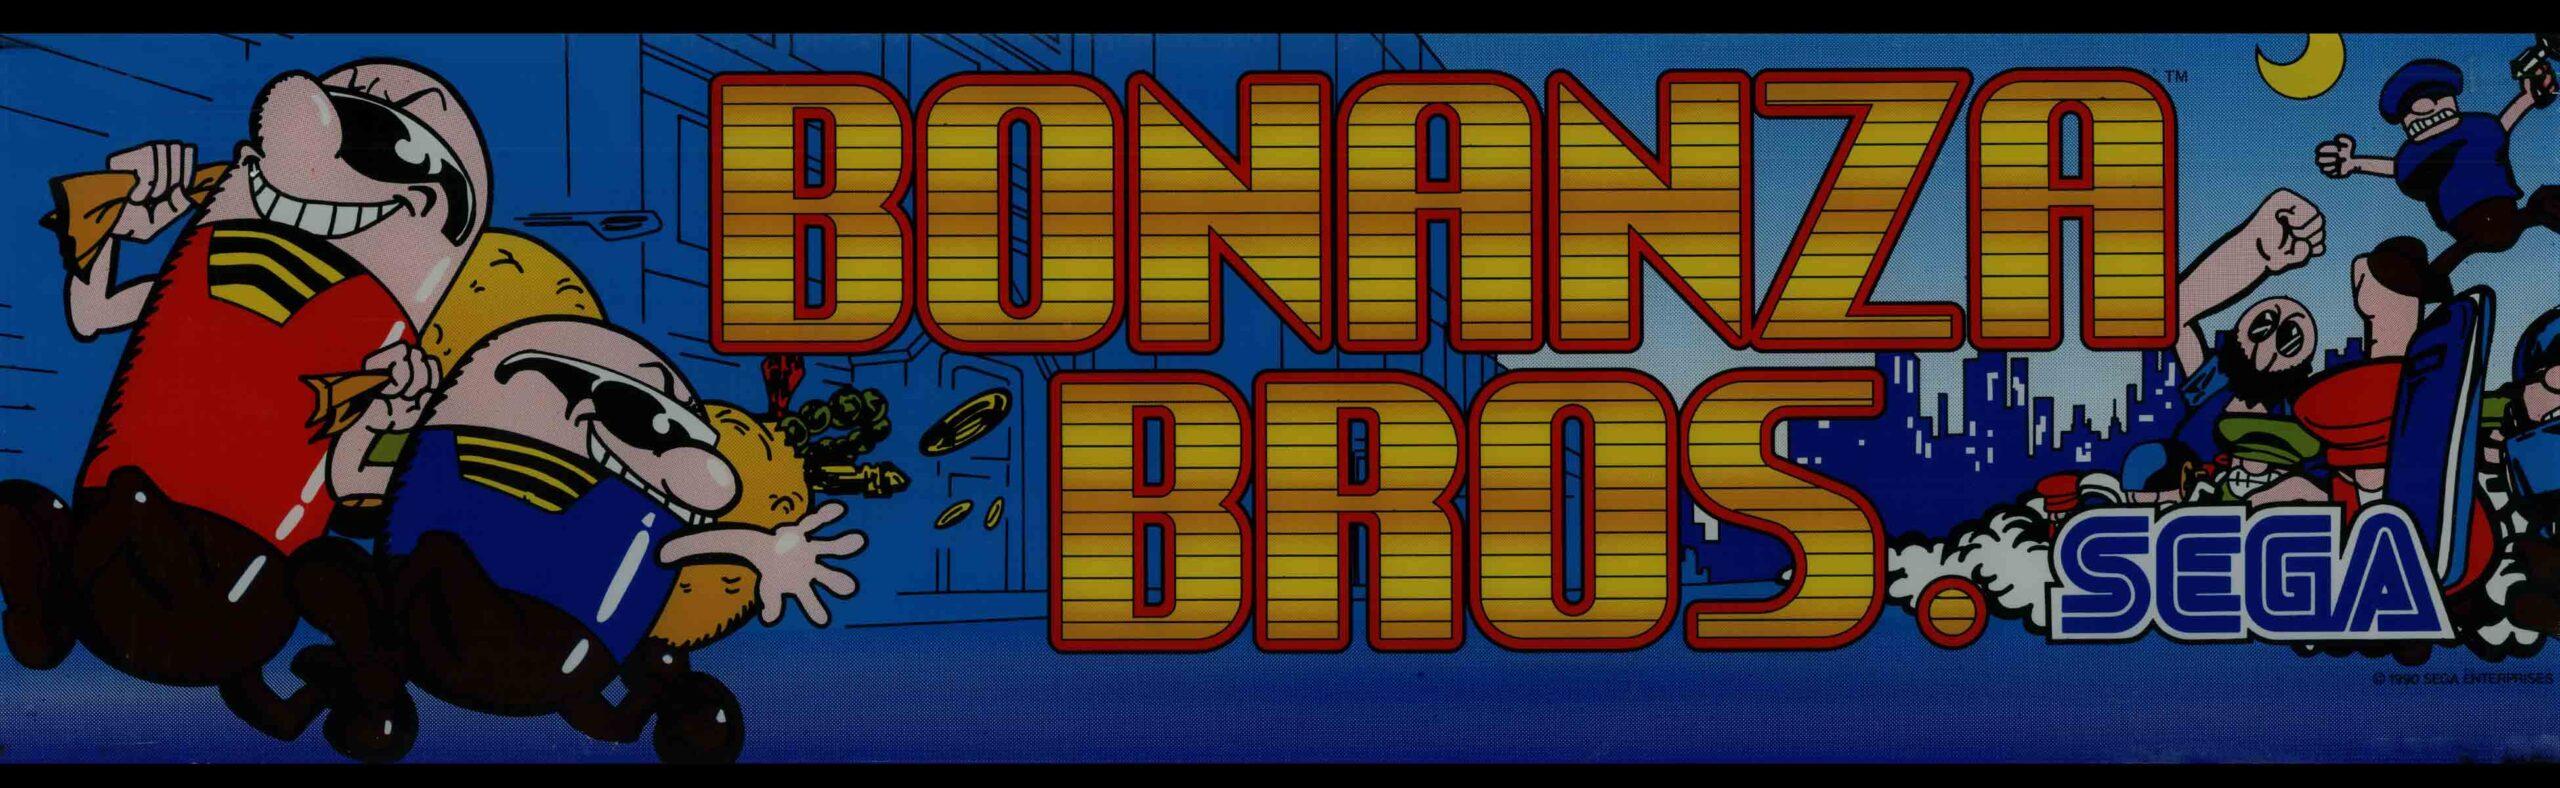 Bonanza Bros Arcade Marquee 26 X 8 Arcade Marquee Dot Com